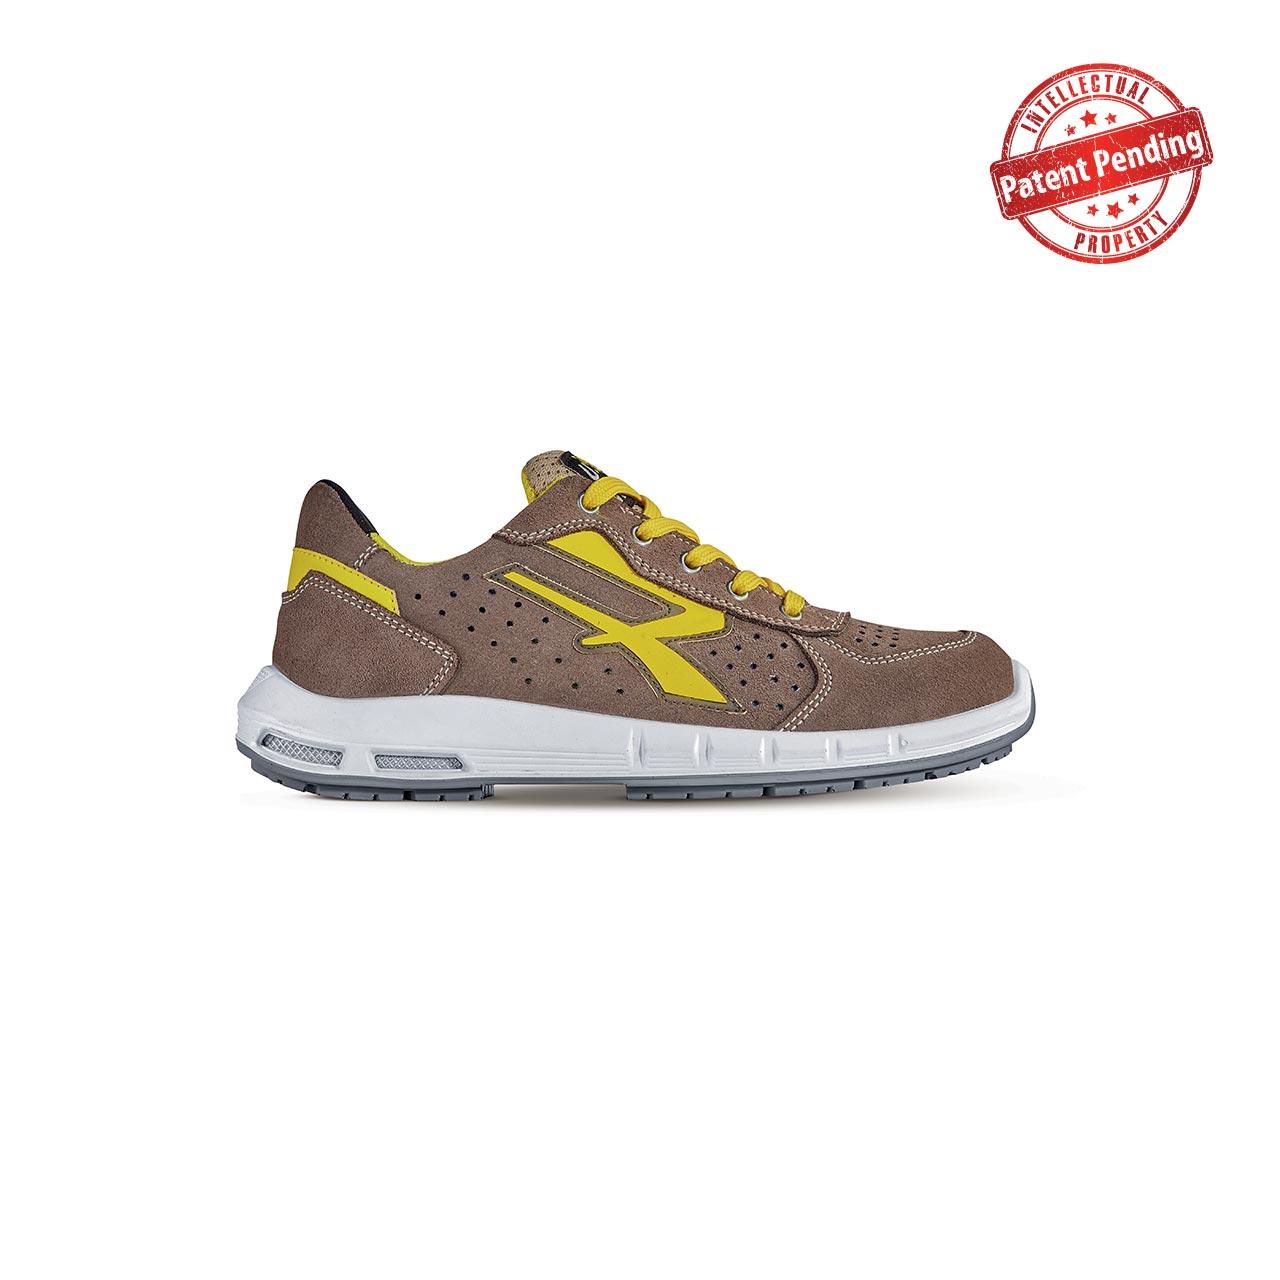 scarpa antinfortunistica upower modello dorado plus linea redup plus vista laterale